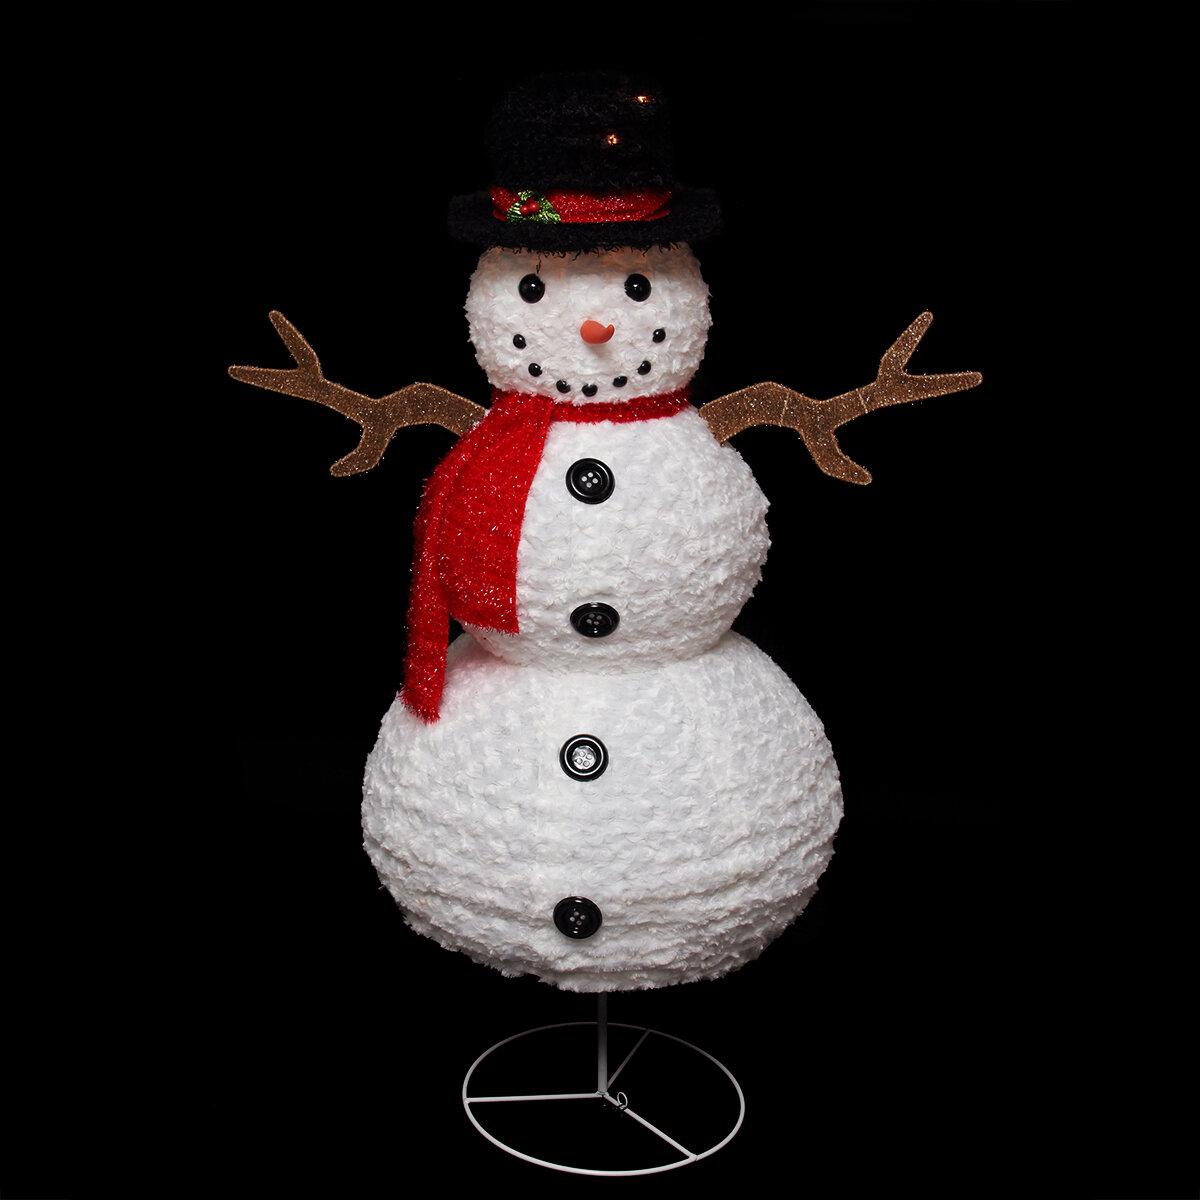 Northlight Pre Lit Outdoor Chenille Swirl Snowman Christmas Decoration Lawn Art Fugurine Wayfair